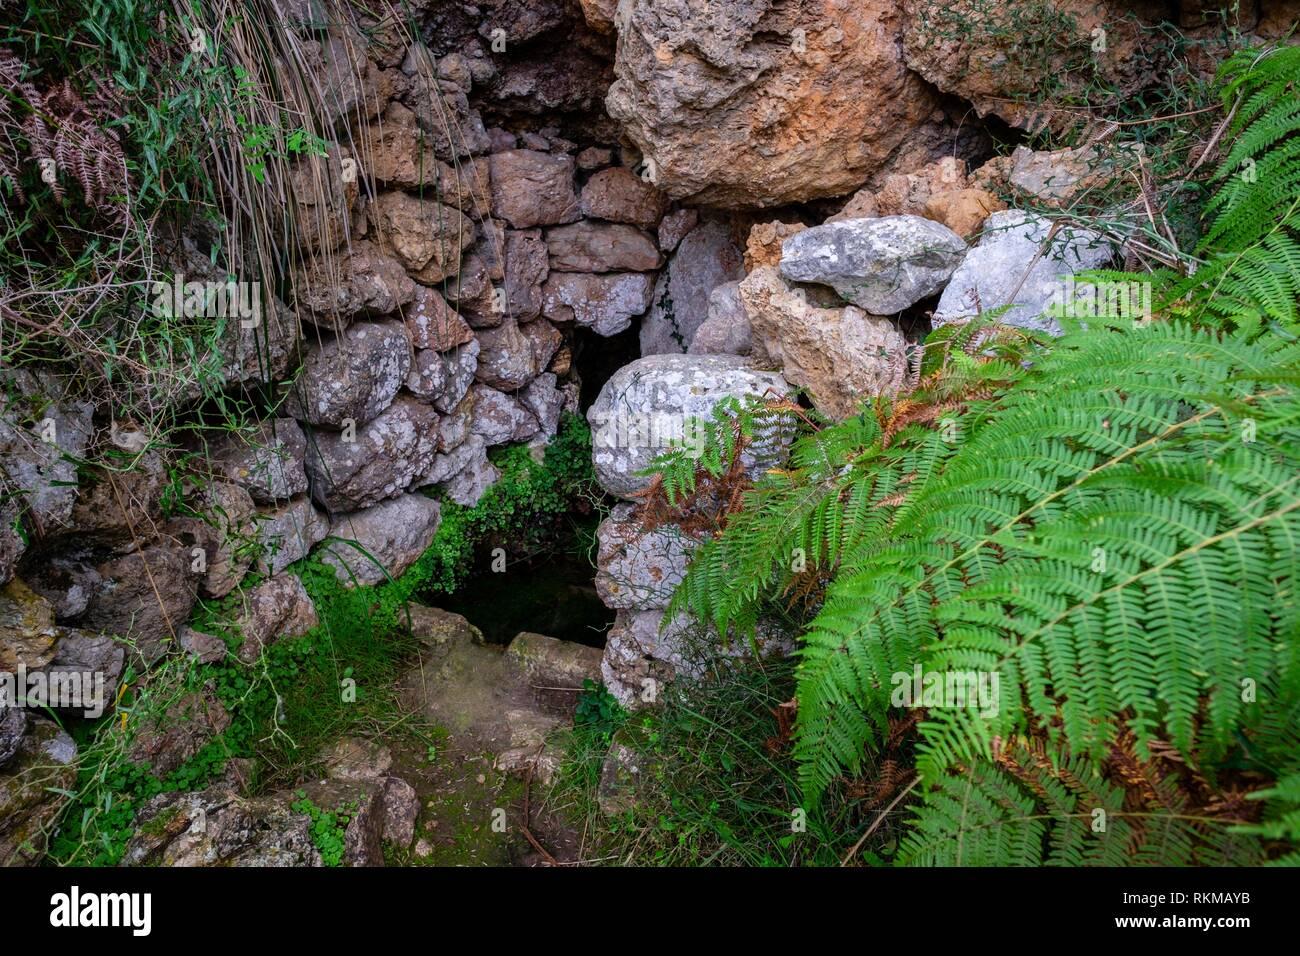 Font Subauma, Escorca, Paraje natural de la Serra de Tramuntana, Maiorca, isole Baleari, Spagna. Immagini Stock